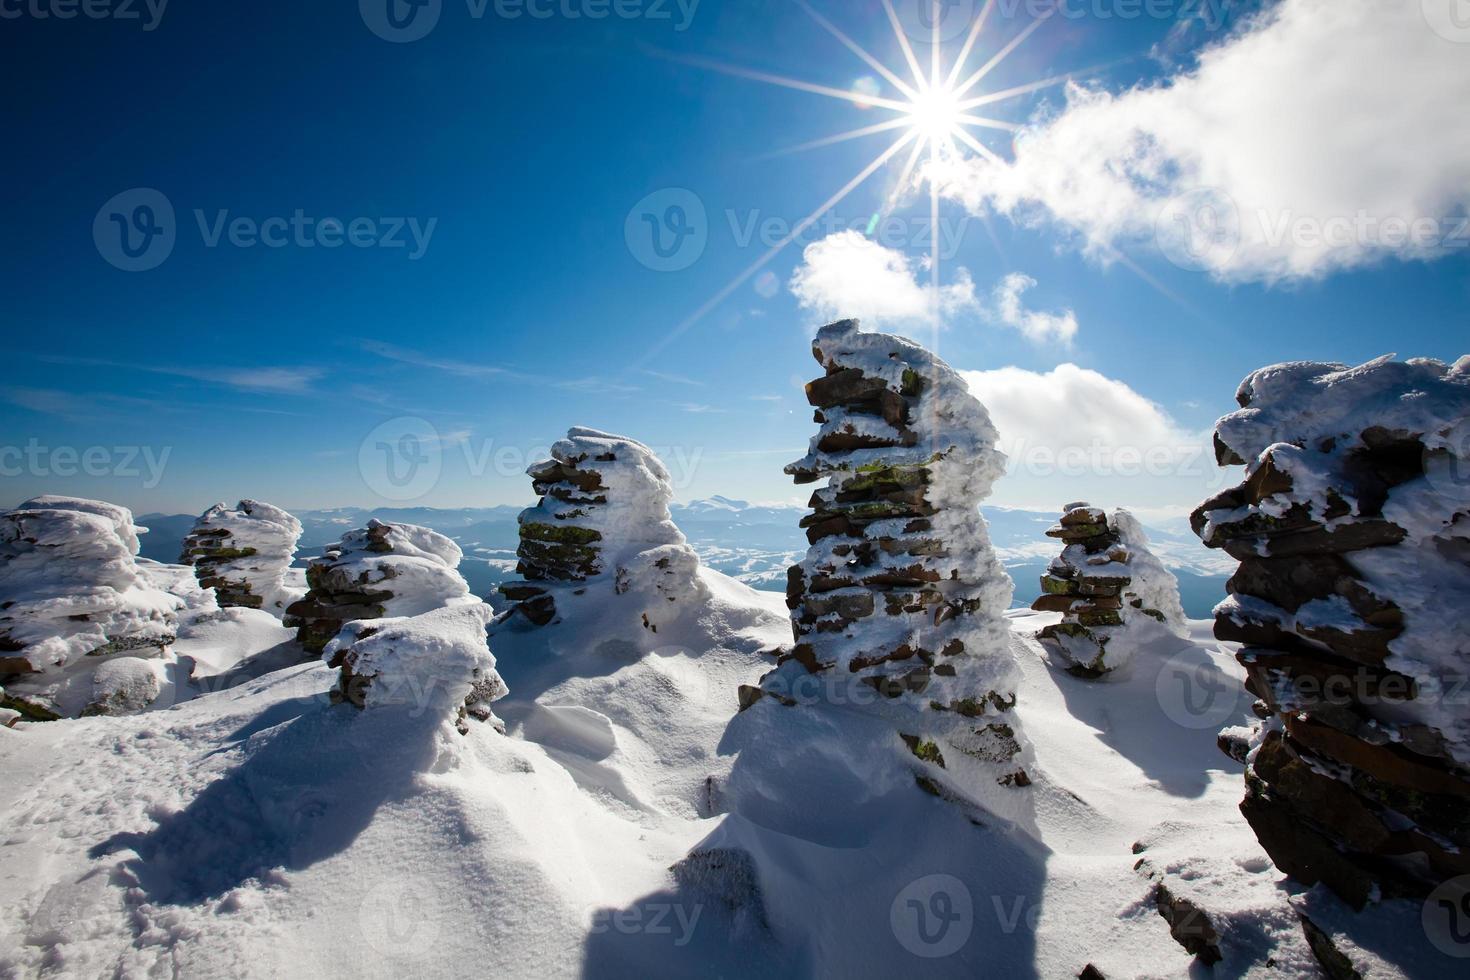 Karpaterna vinterberg foto